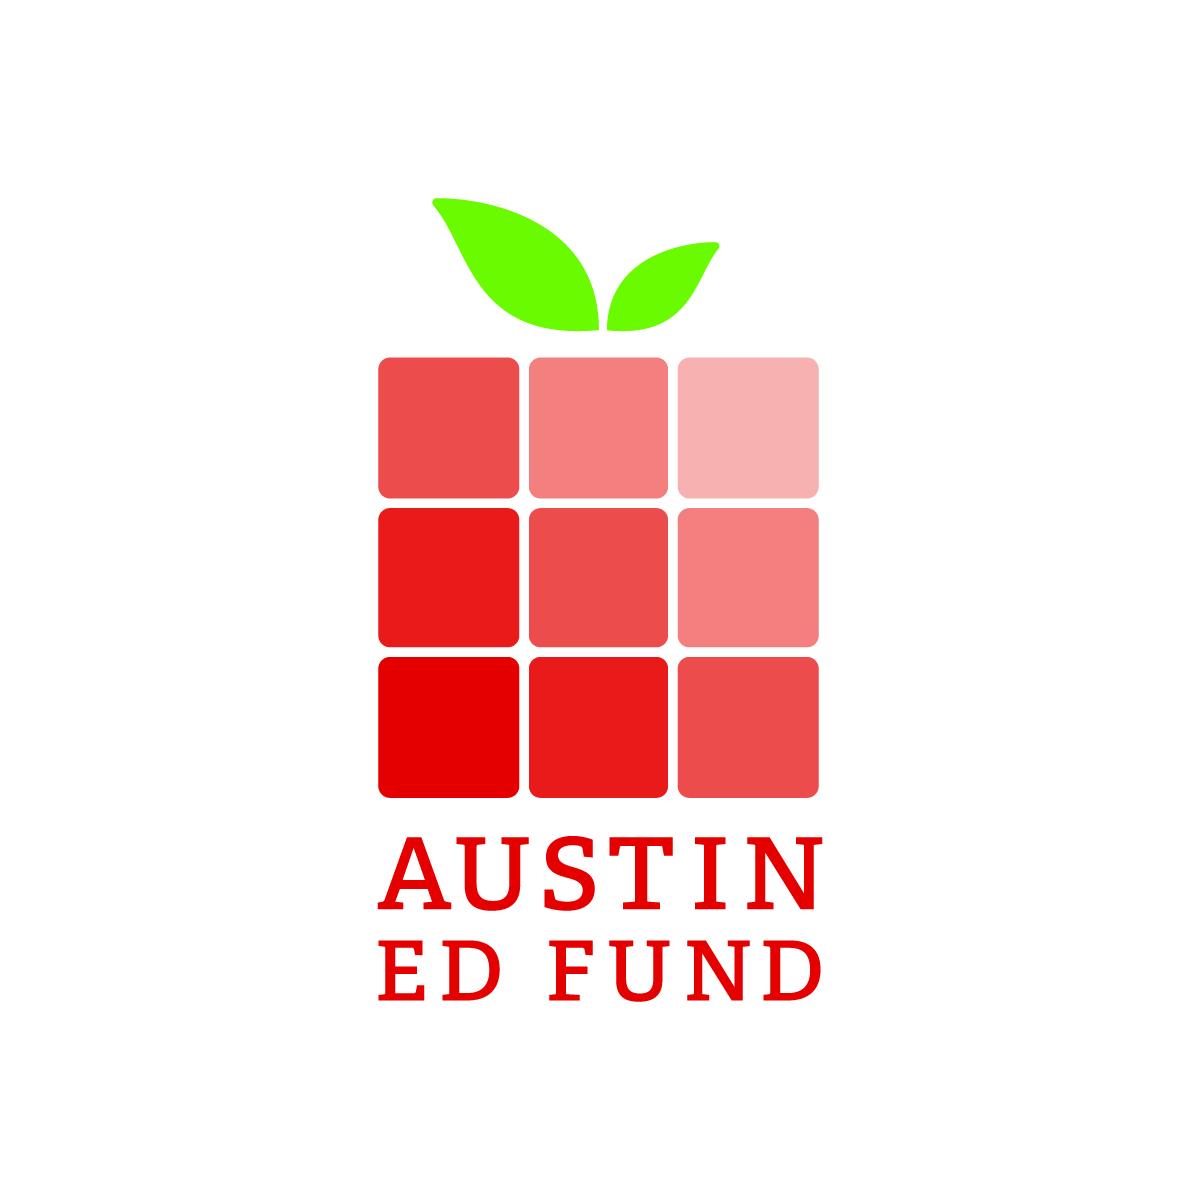 Austin Ed Fund Annual Campaign